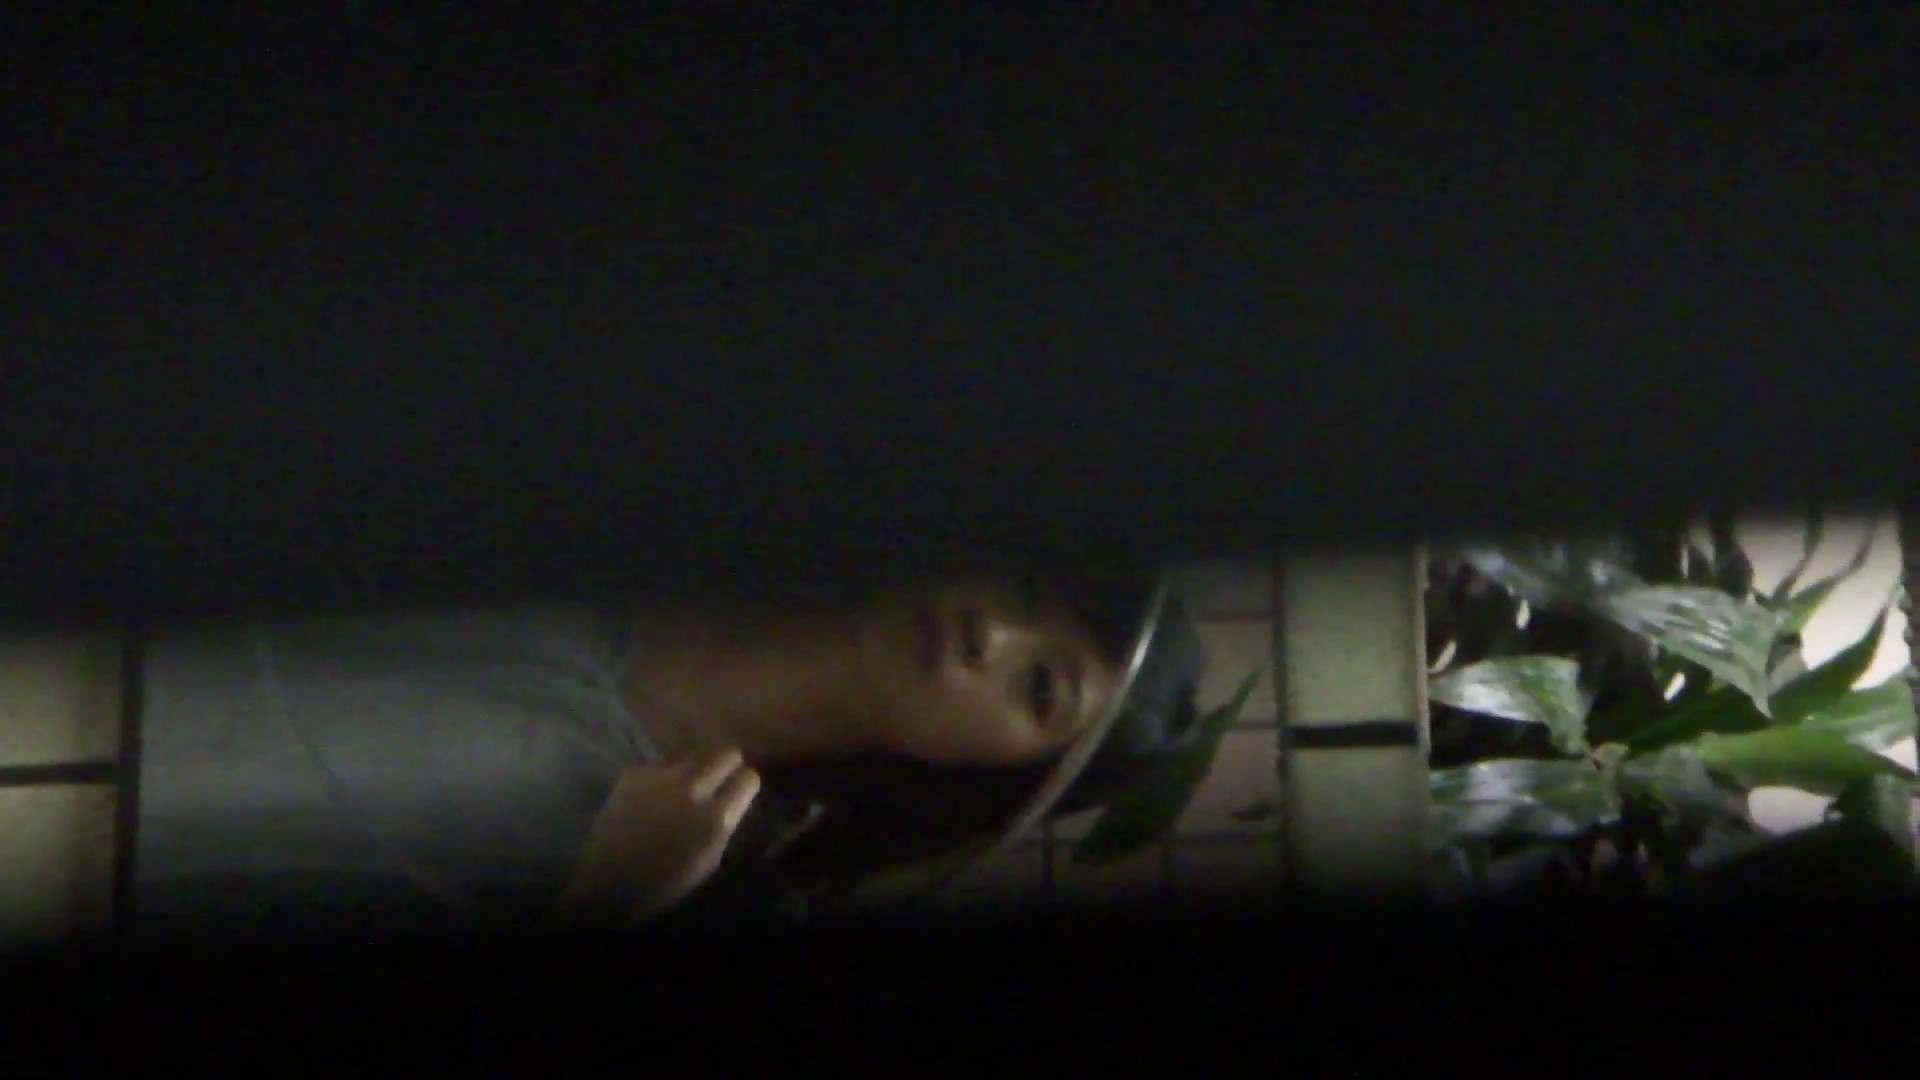 JD盗撮 美女の洗面所の秘密 Vol.76 ギャル攻め ぱこり動画紹介 99画像 82